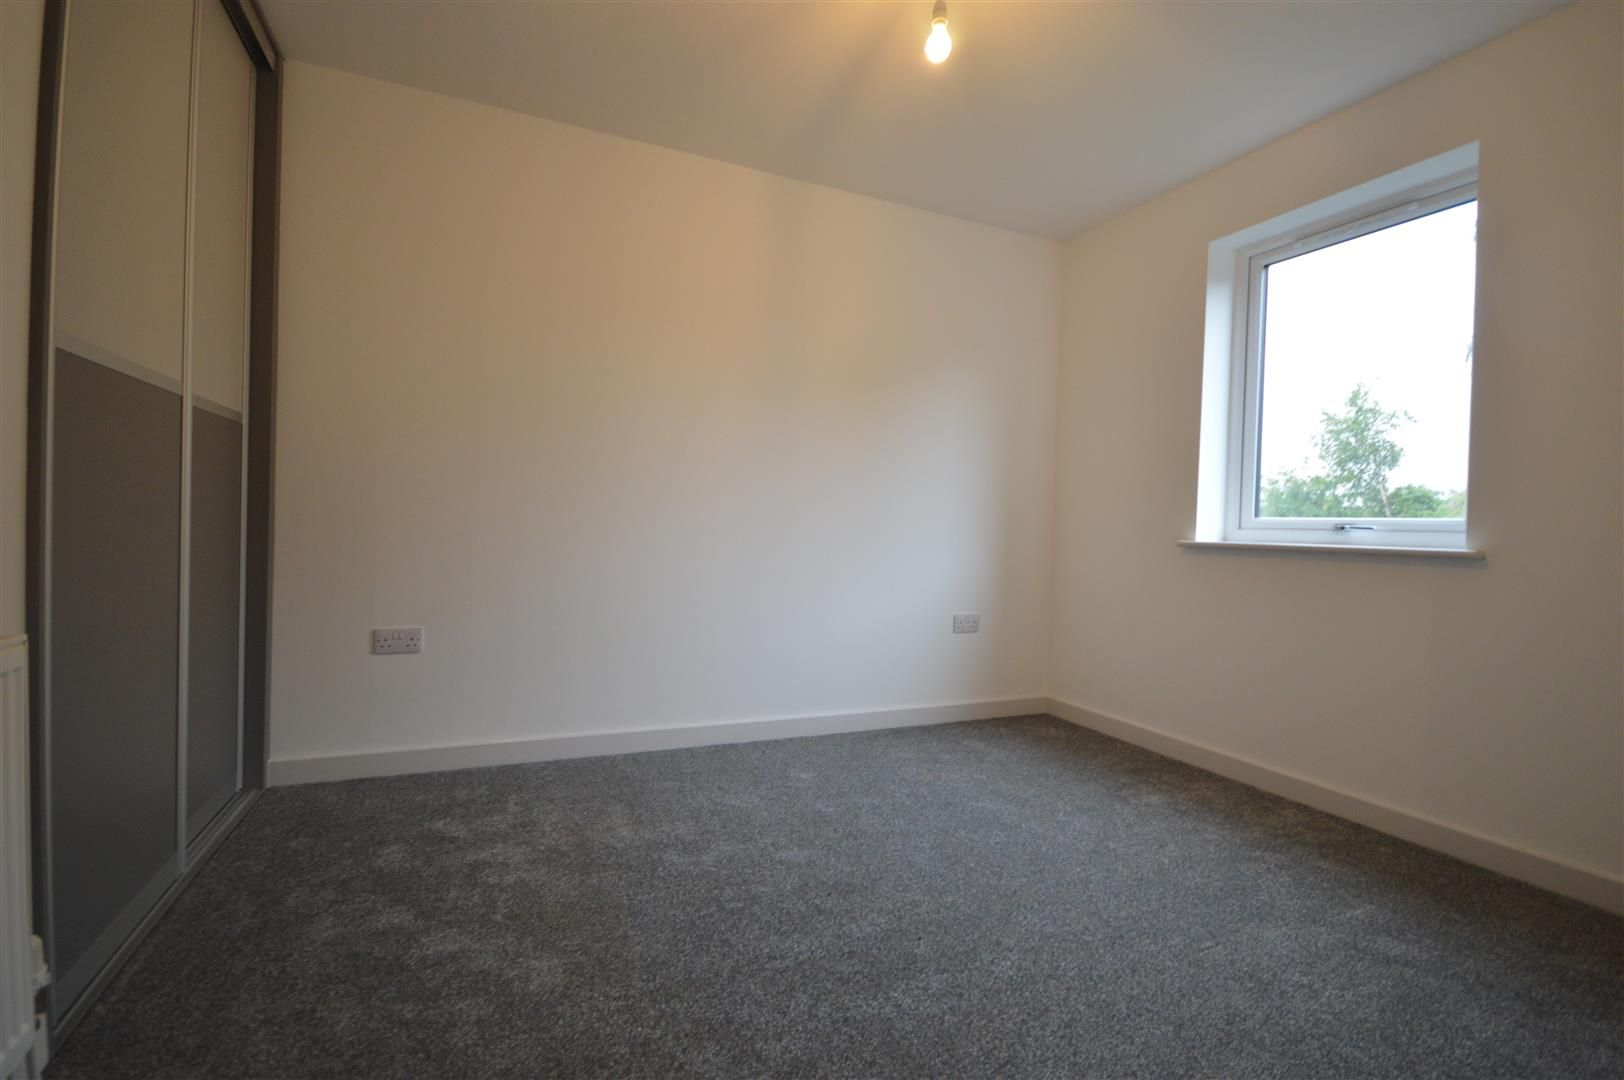 2 bed detached for sale in Leominster  - Property Image 9